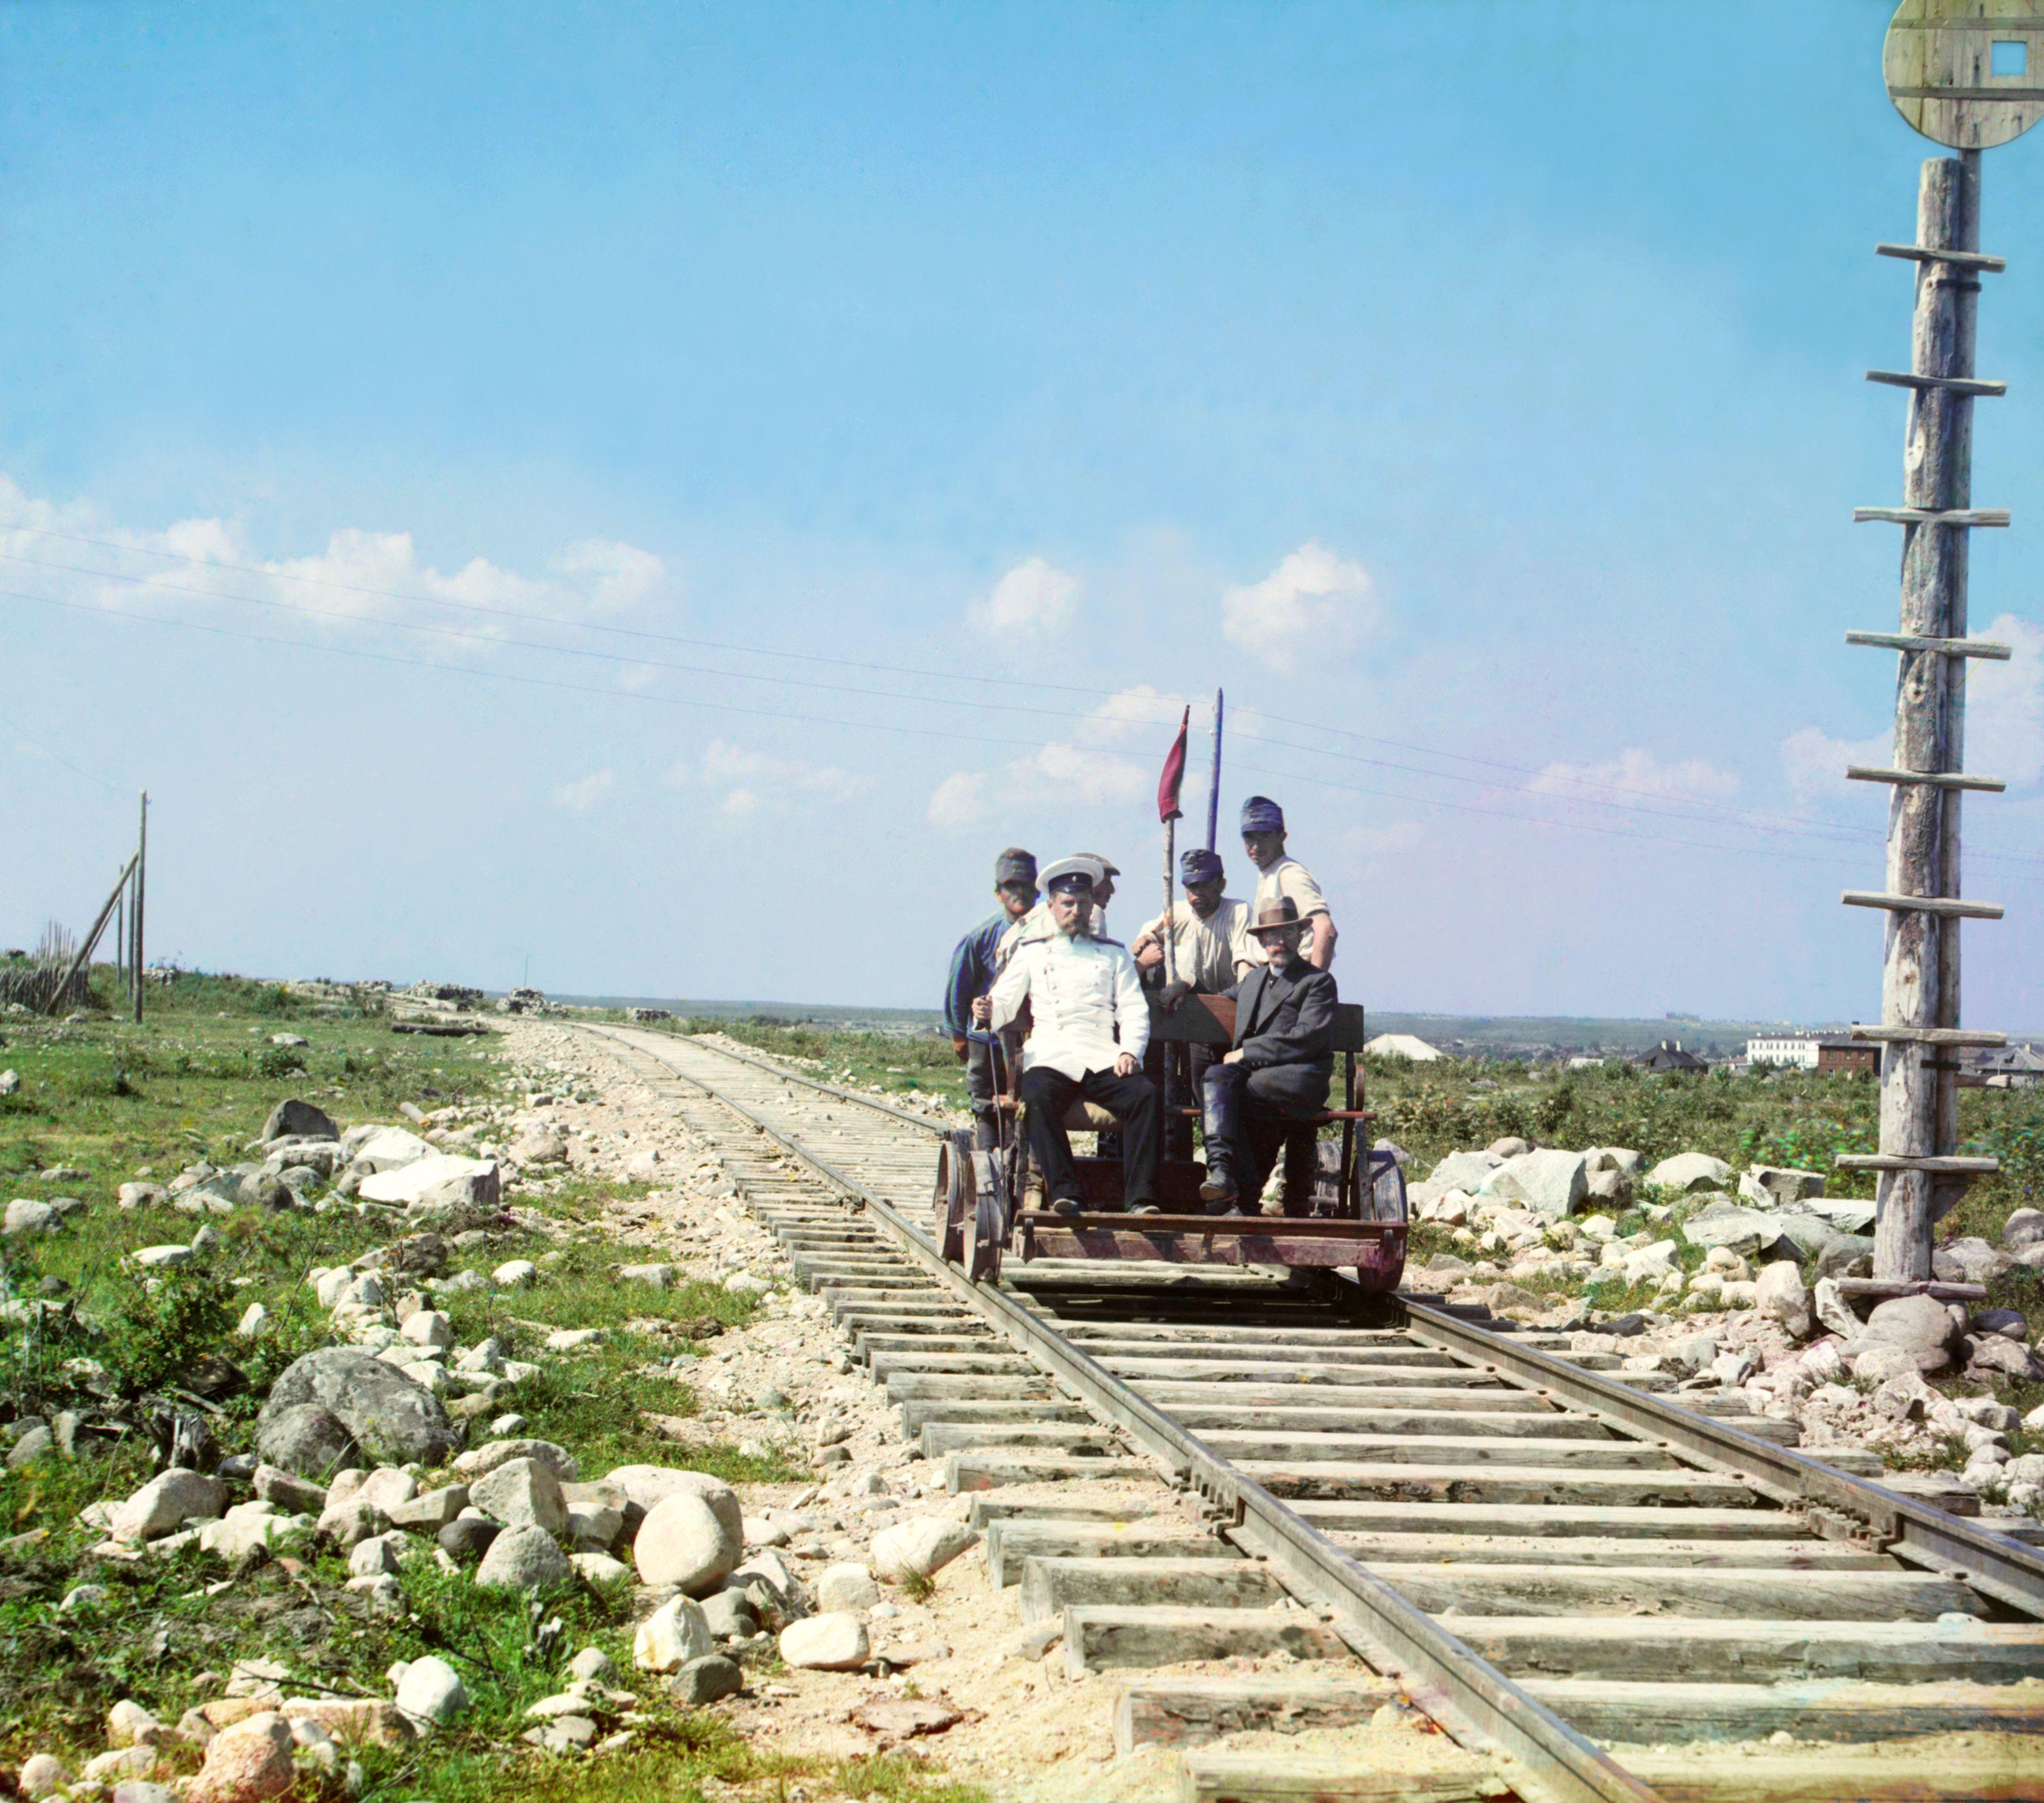 (1915) On the handcar outside Petrozavodsk on the Murmansk railway.